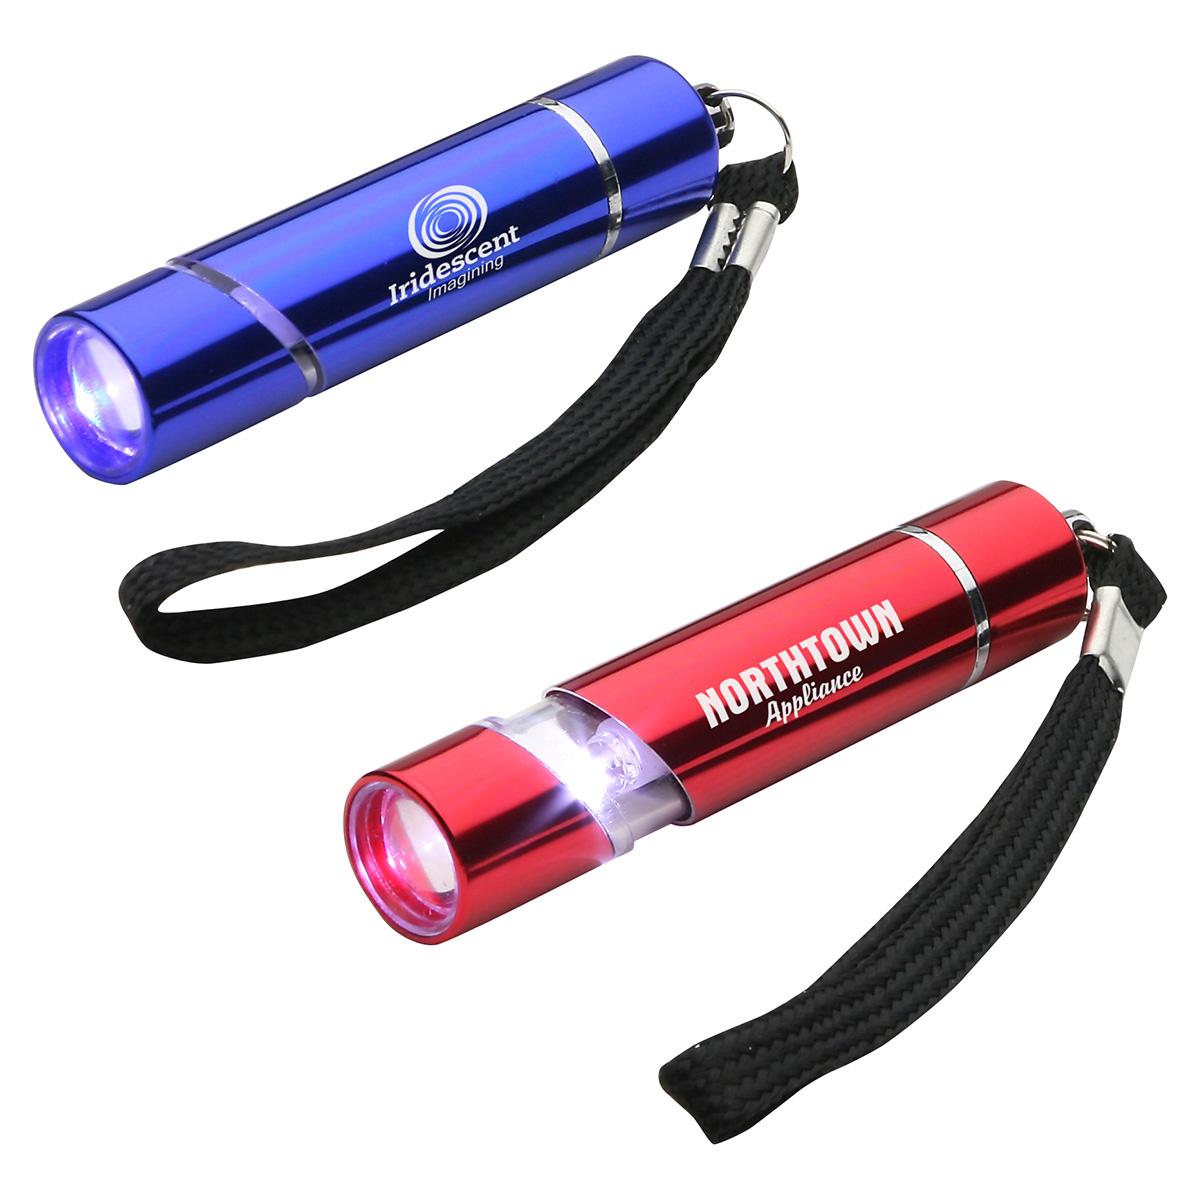 Aluminum Scope LED Flashlight, WLT-AS12 - 1 Colour Imprint